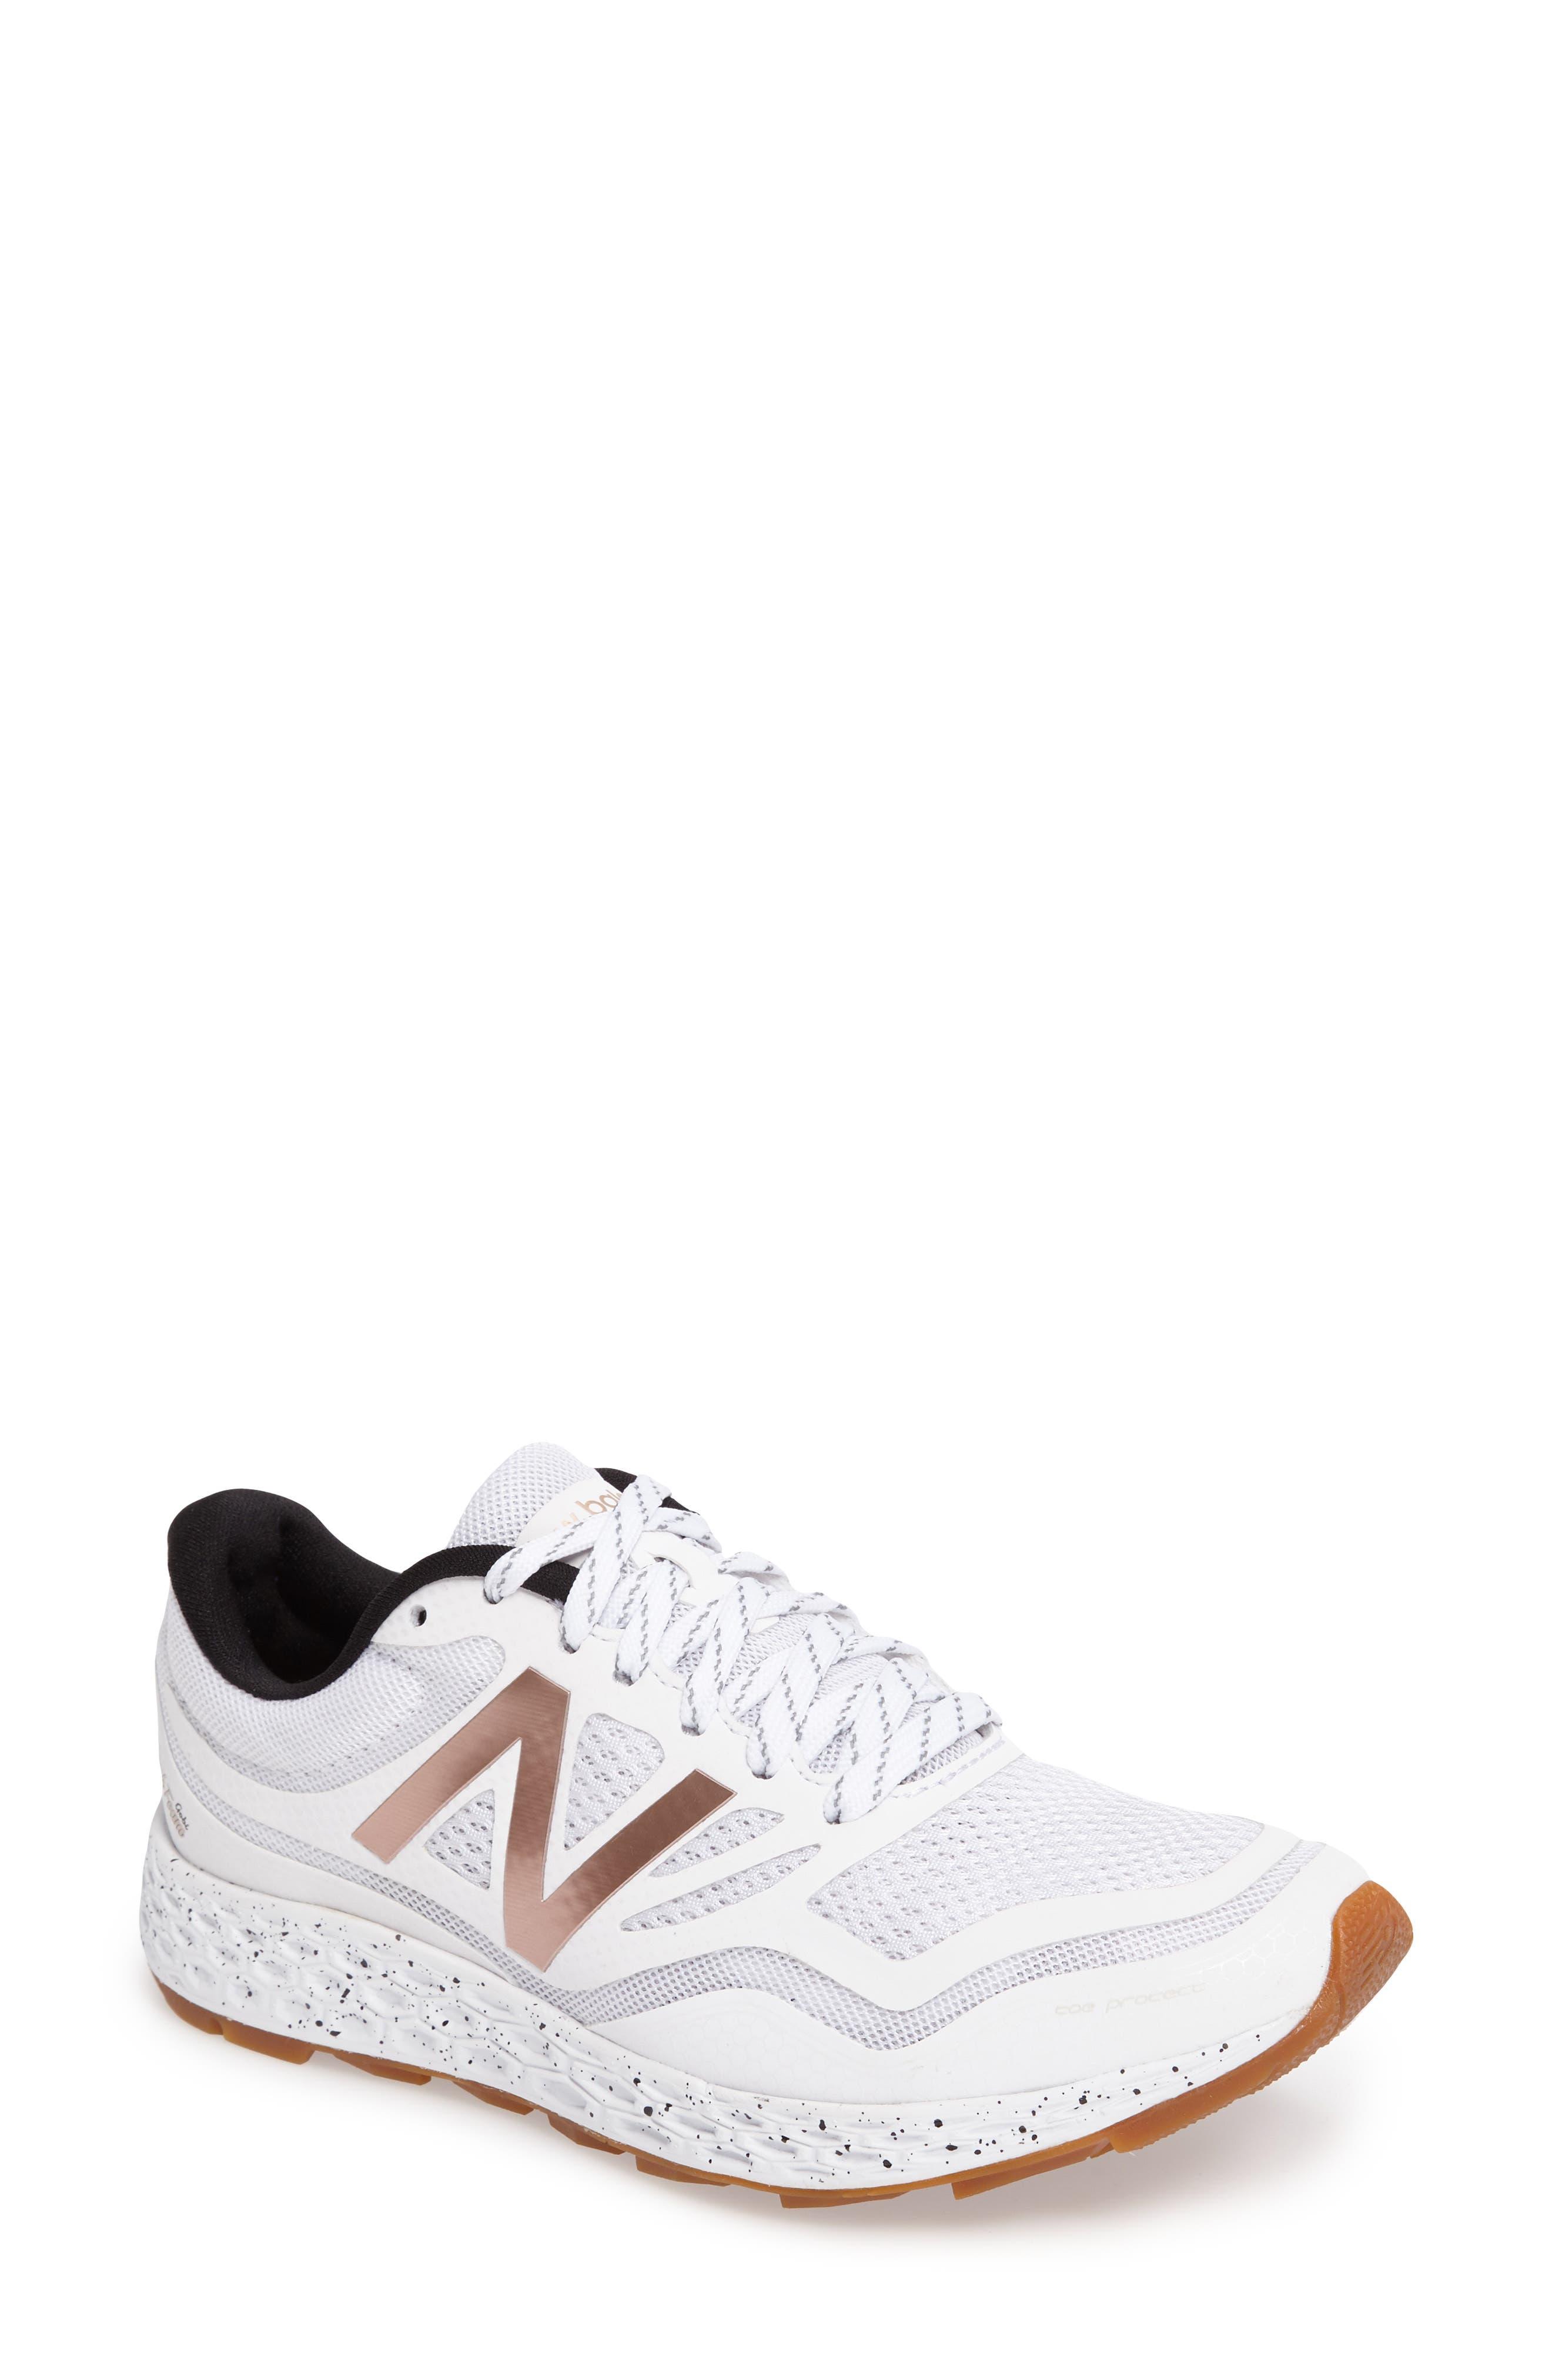 Alternate Image 1 Selected - New Balance Gobi Fresh Foam Trail Running Shoe (Women)